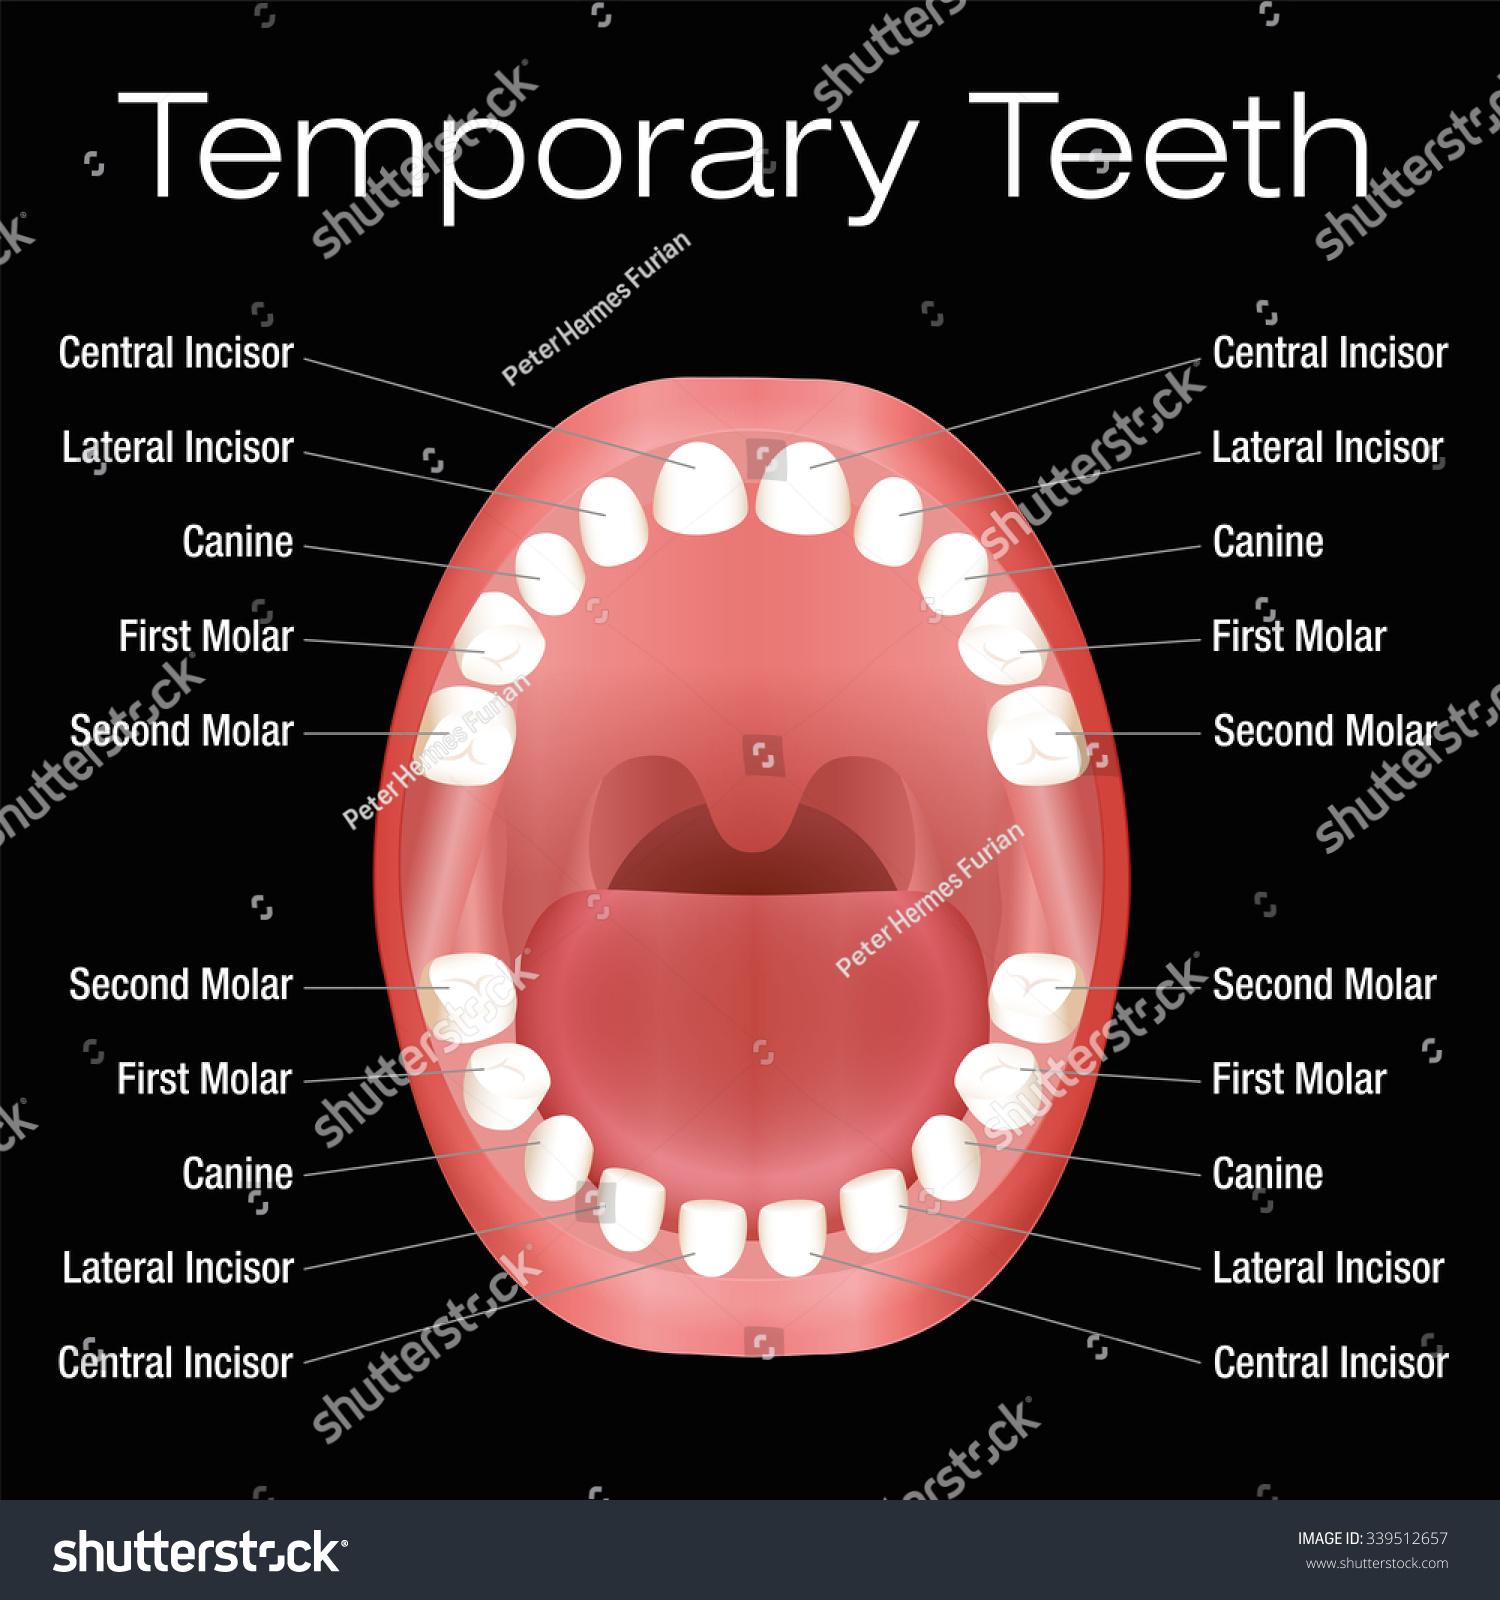 Primary Teeth Temporary Teeth Names Vector Stock Vector 339512657 ...